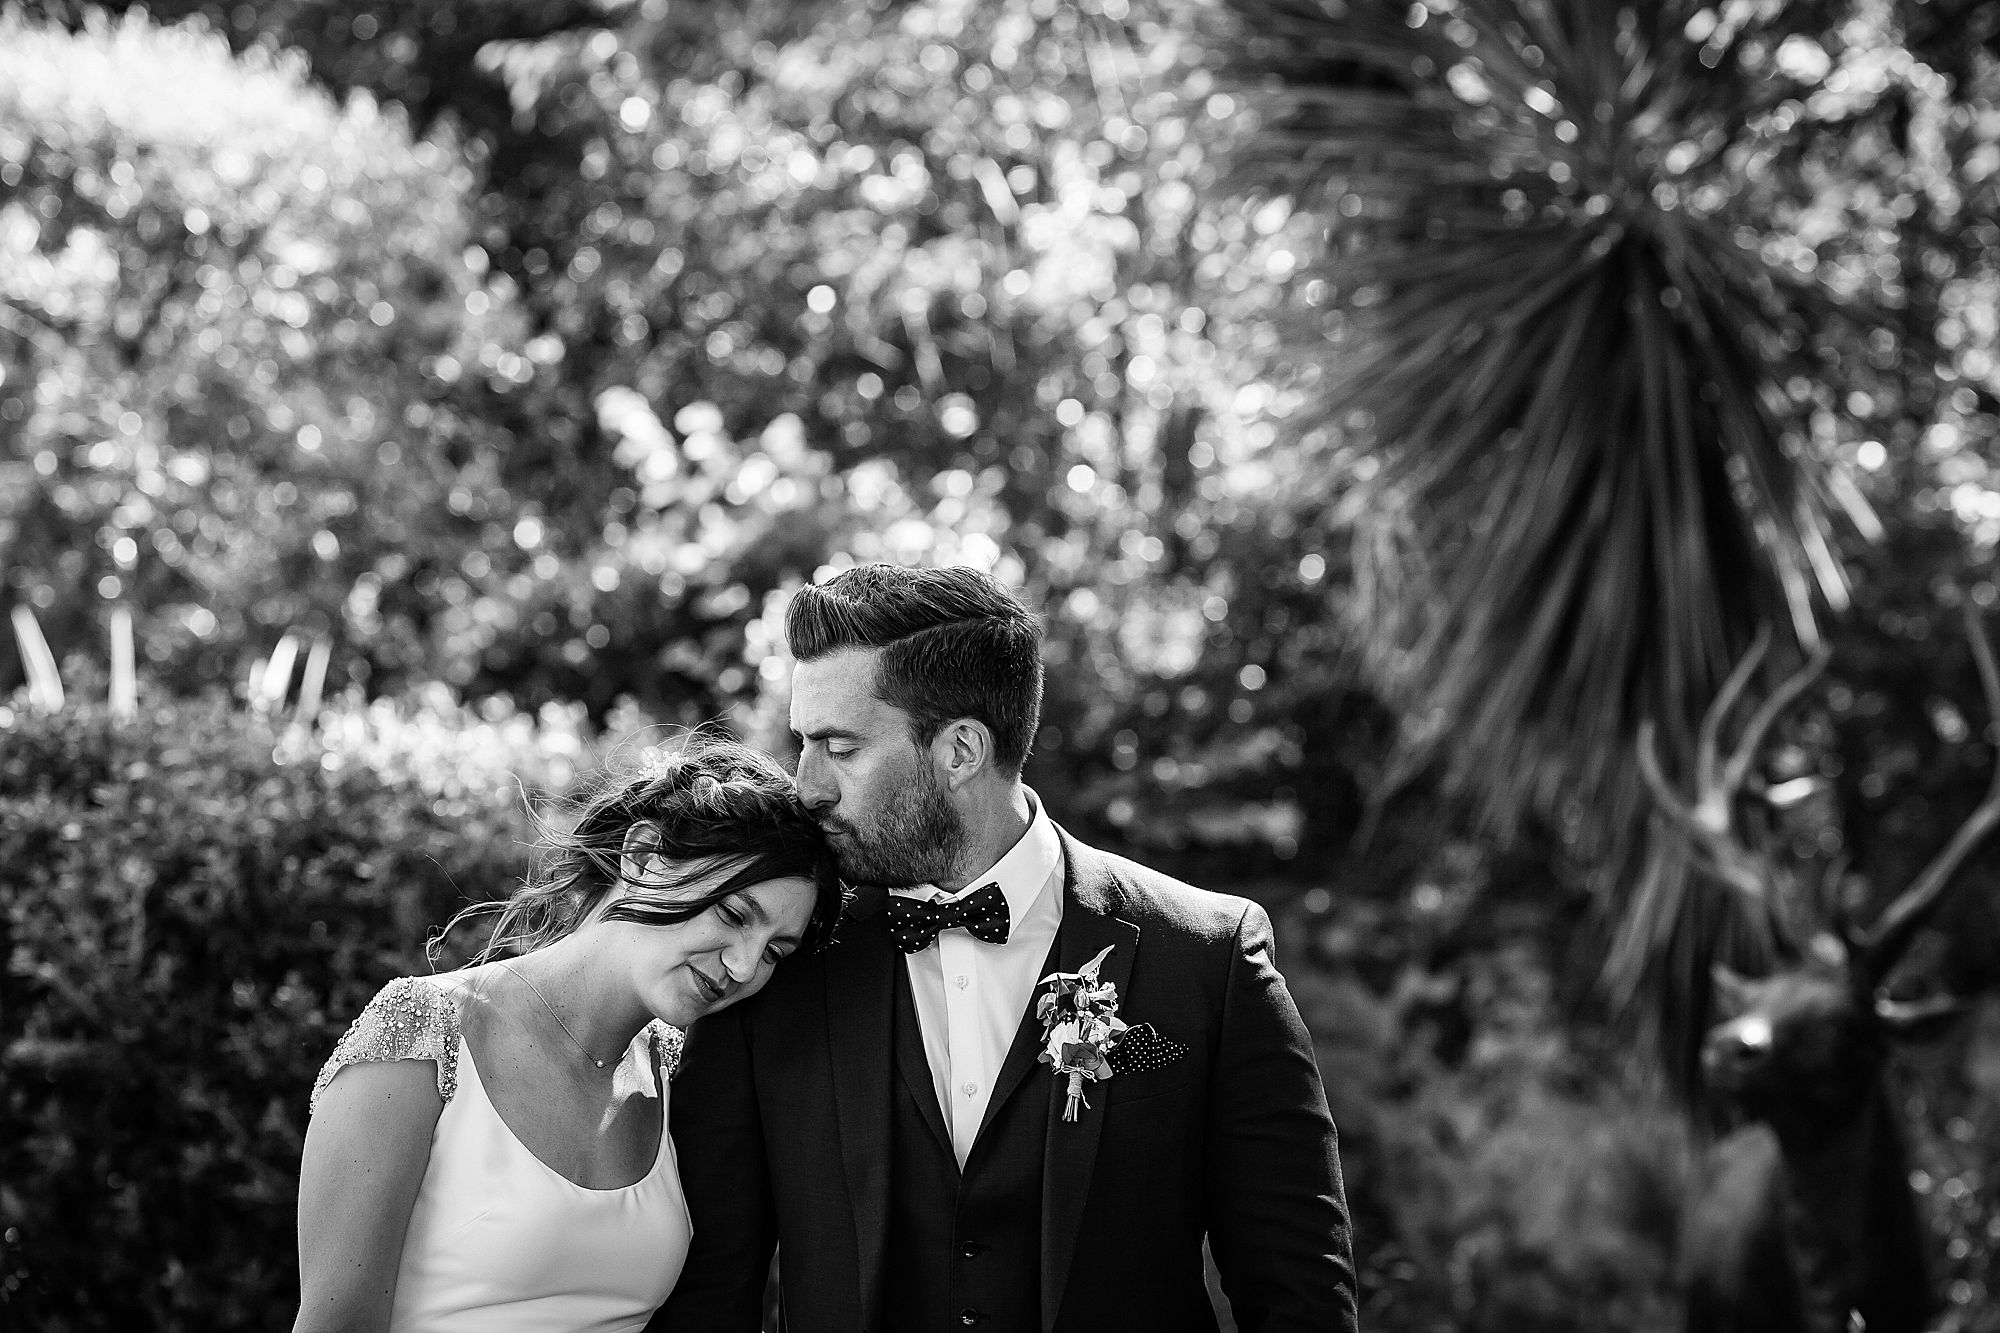 Chateau Rieutort wedding romantic black and white portrait